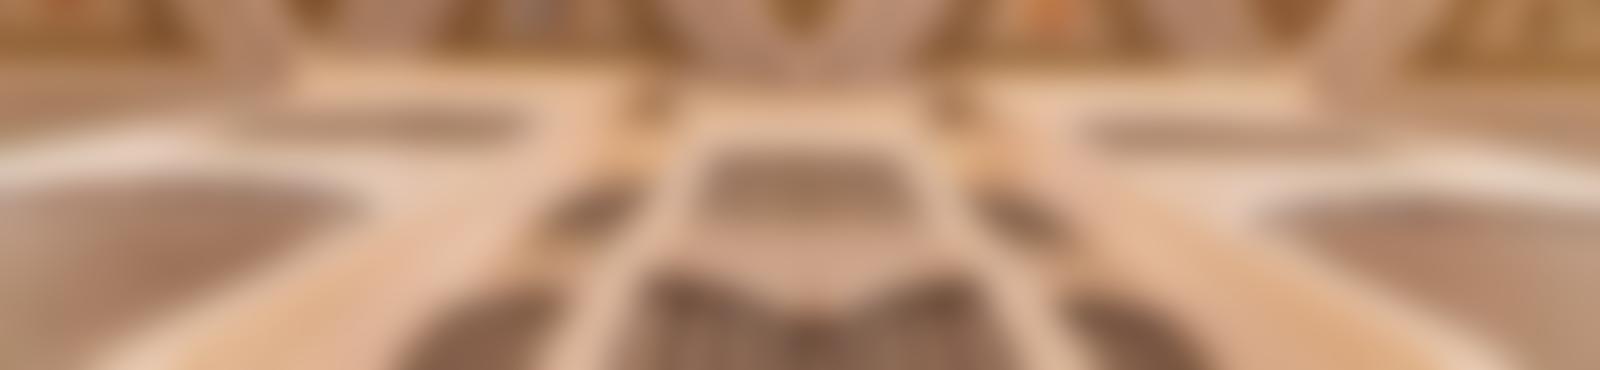 Blurred c17cb49f 9e69 4f75 9dac c03258d6b62f